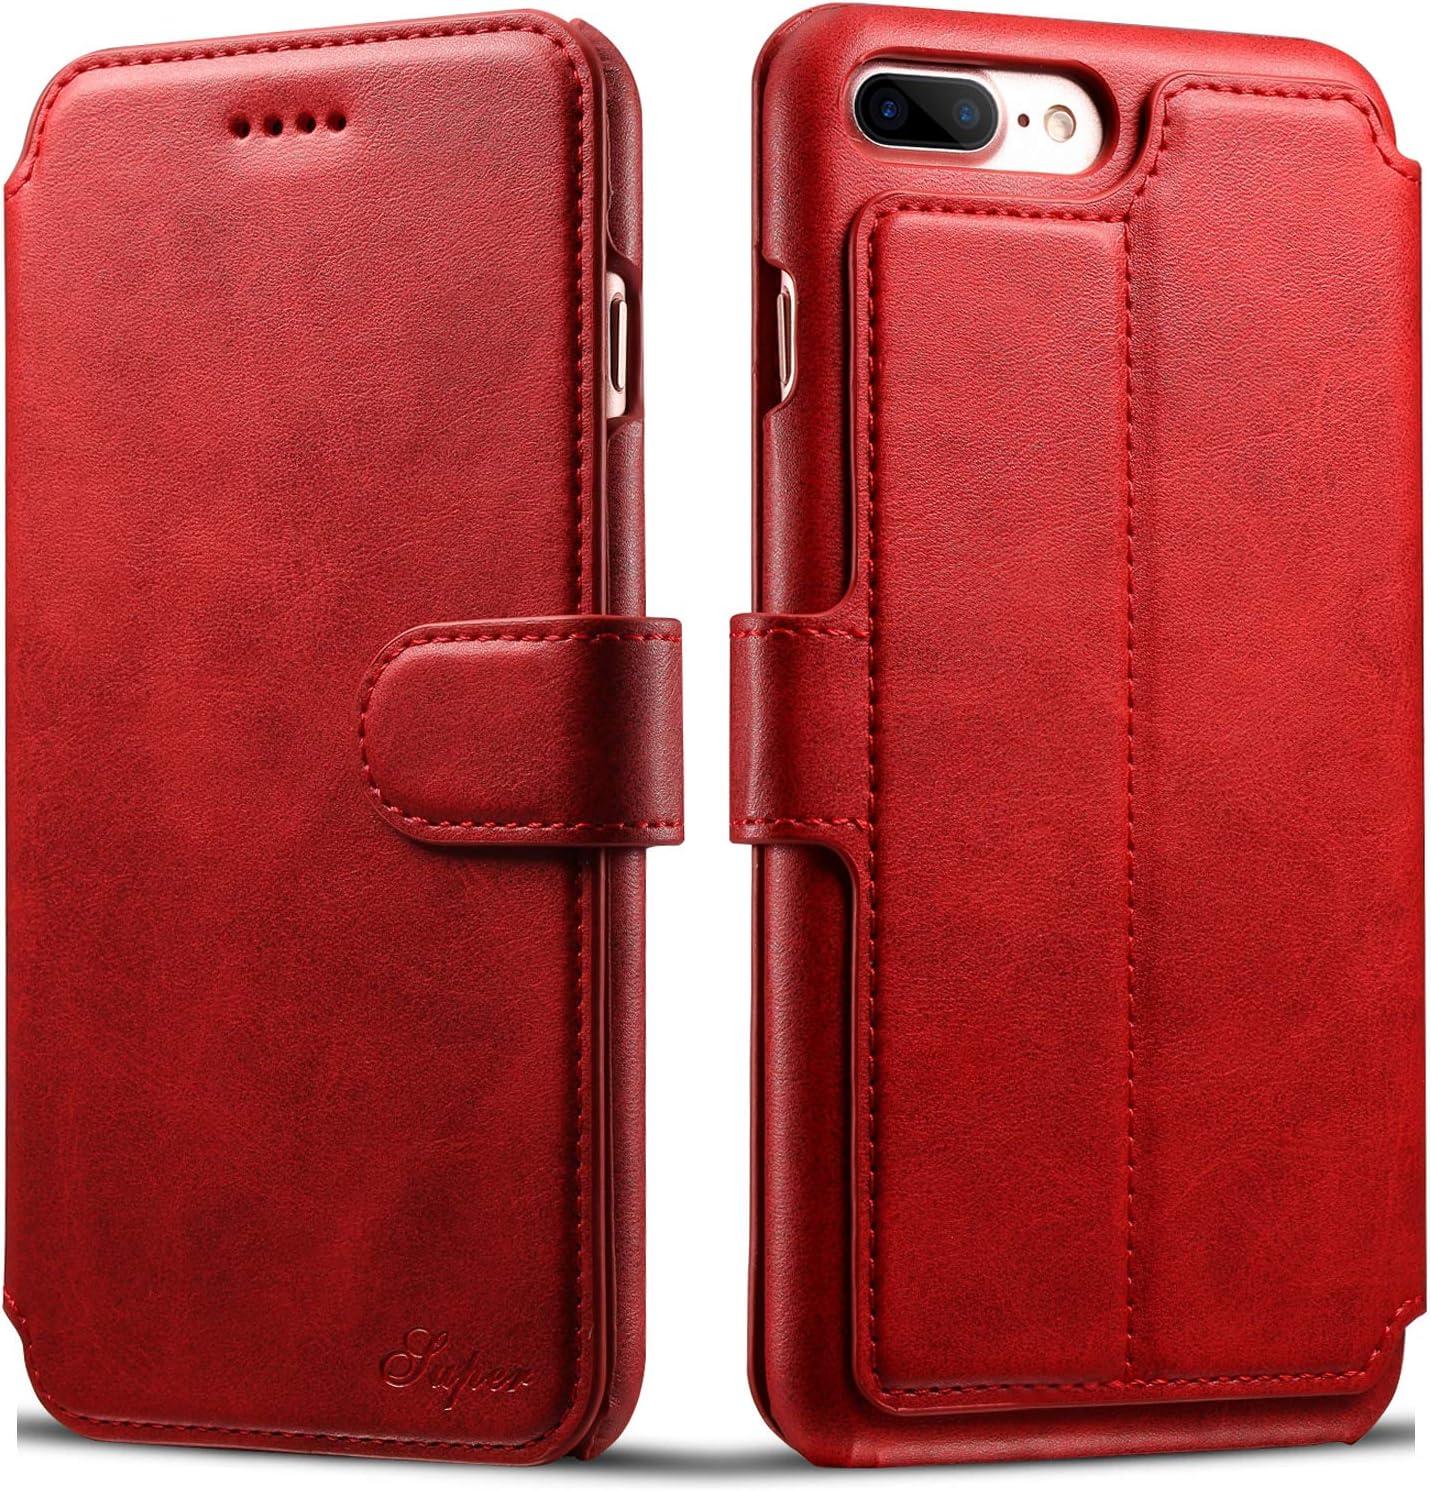 iPhone 7 Plus Case, iPhone 8 Plus Leather Wallet Case [Card Slot] [Kickstand View] [Magnetic Closure] Folio Flip Slim Cover (iPhone 7 Plus/8 Plus (5.5